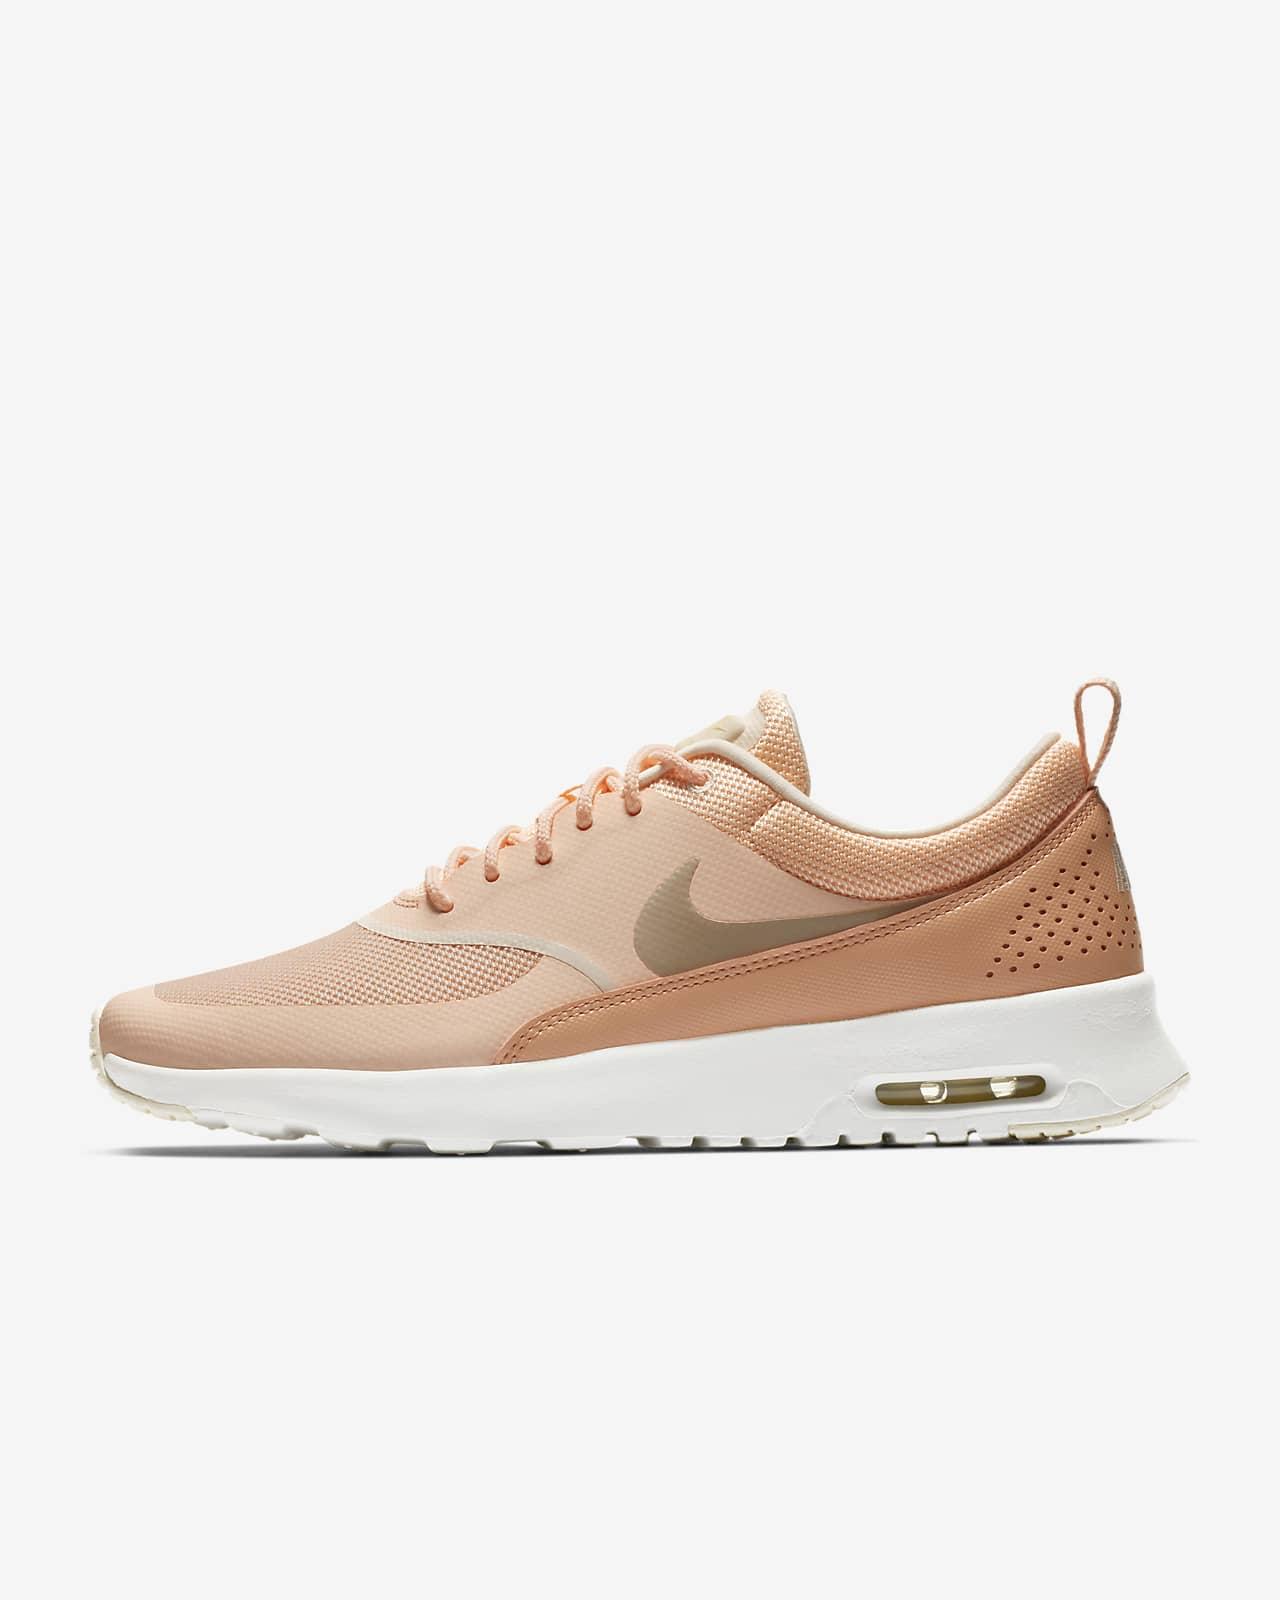 Nike Air Max Thea damesko